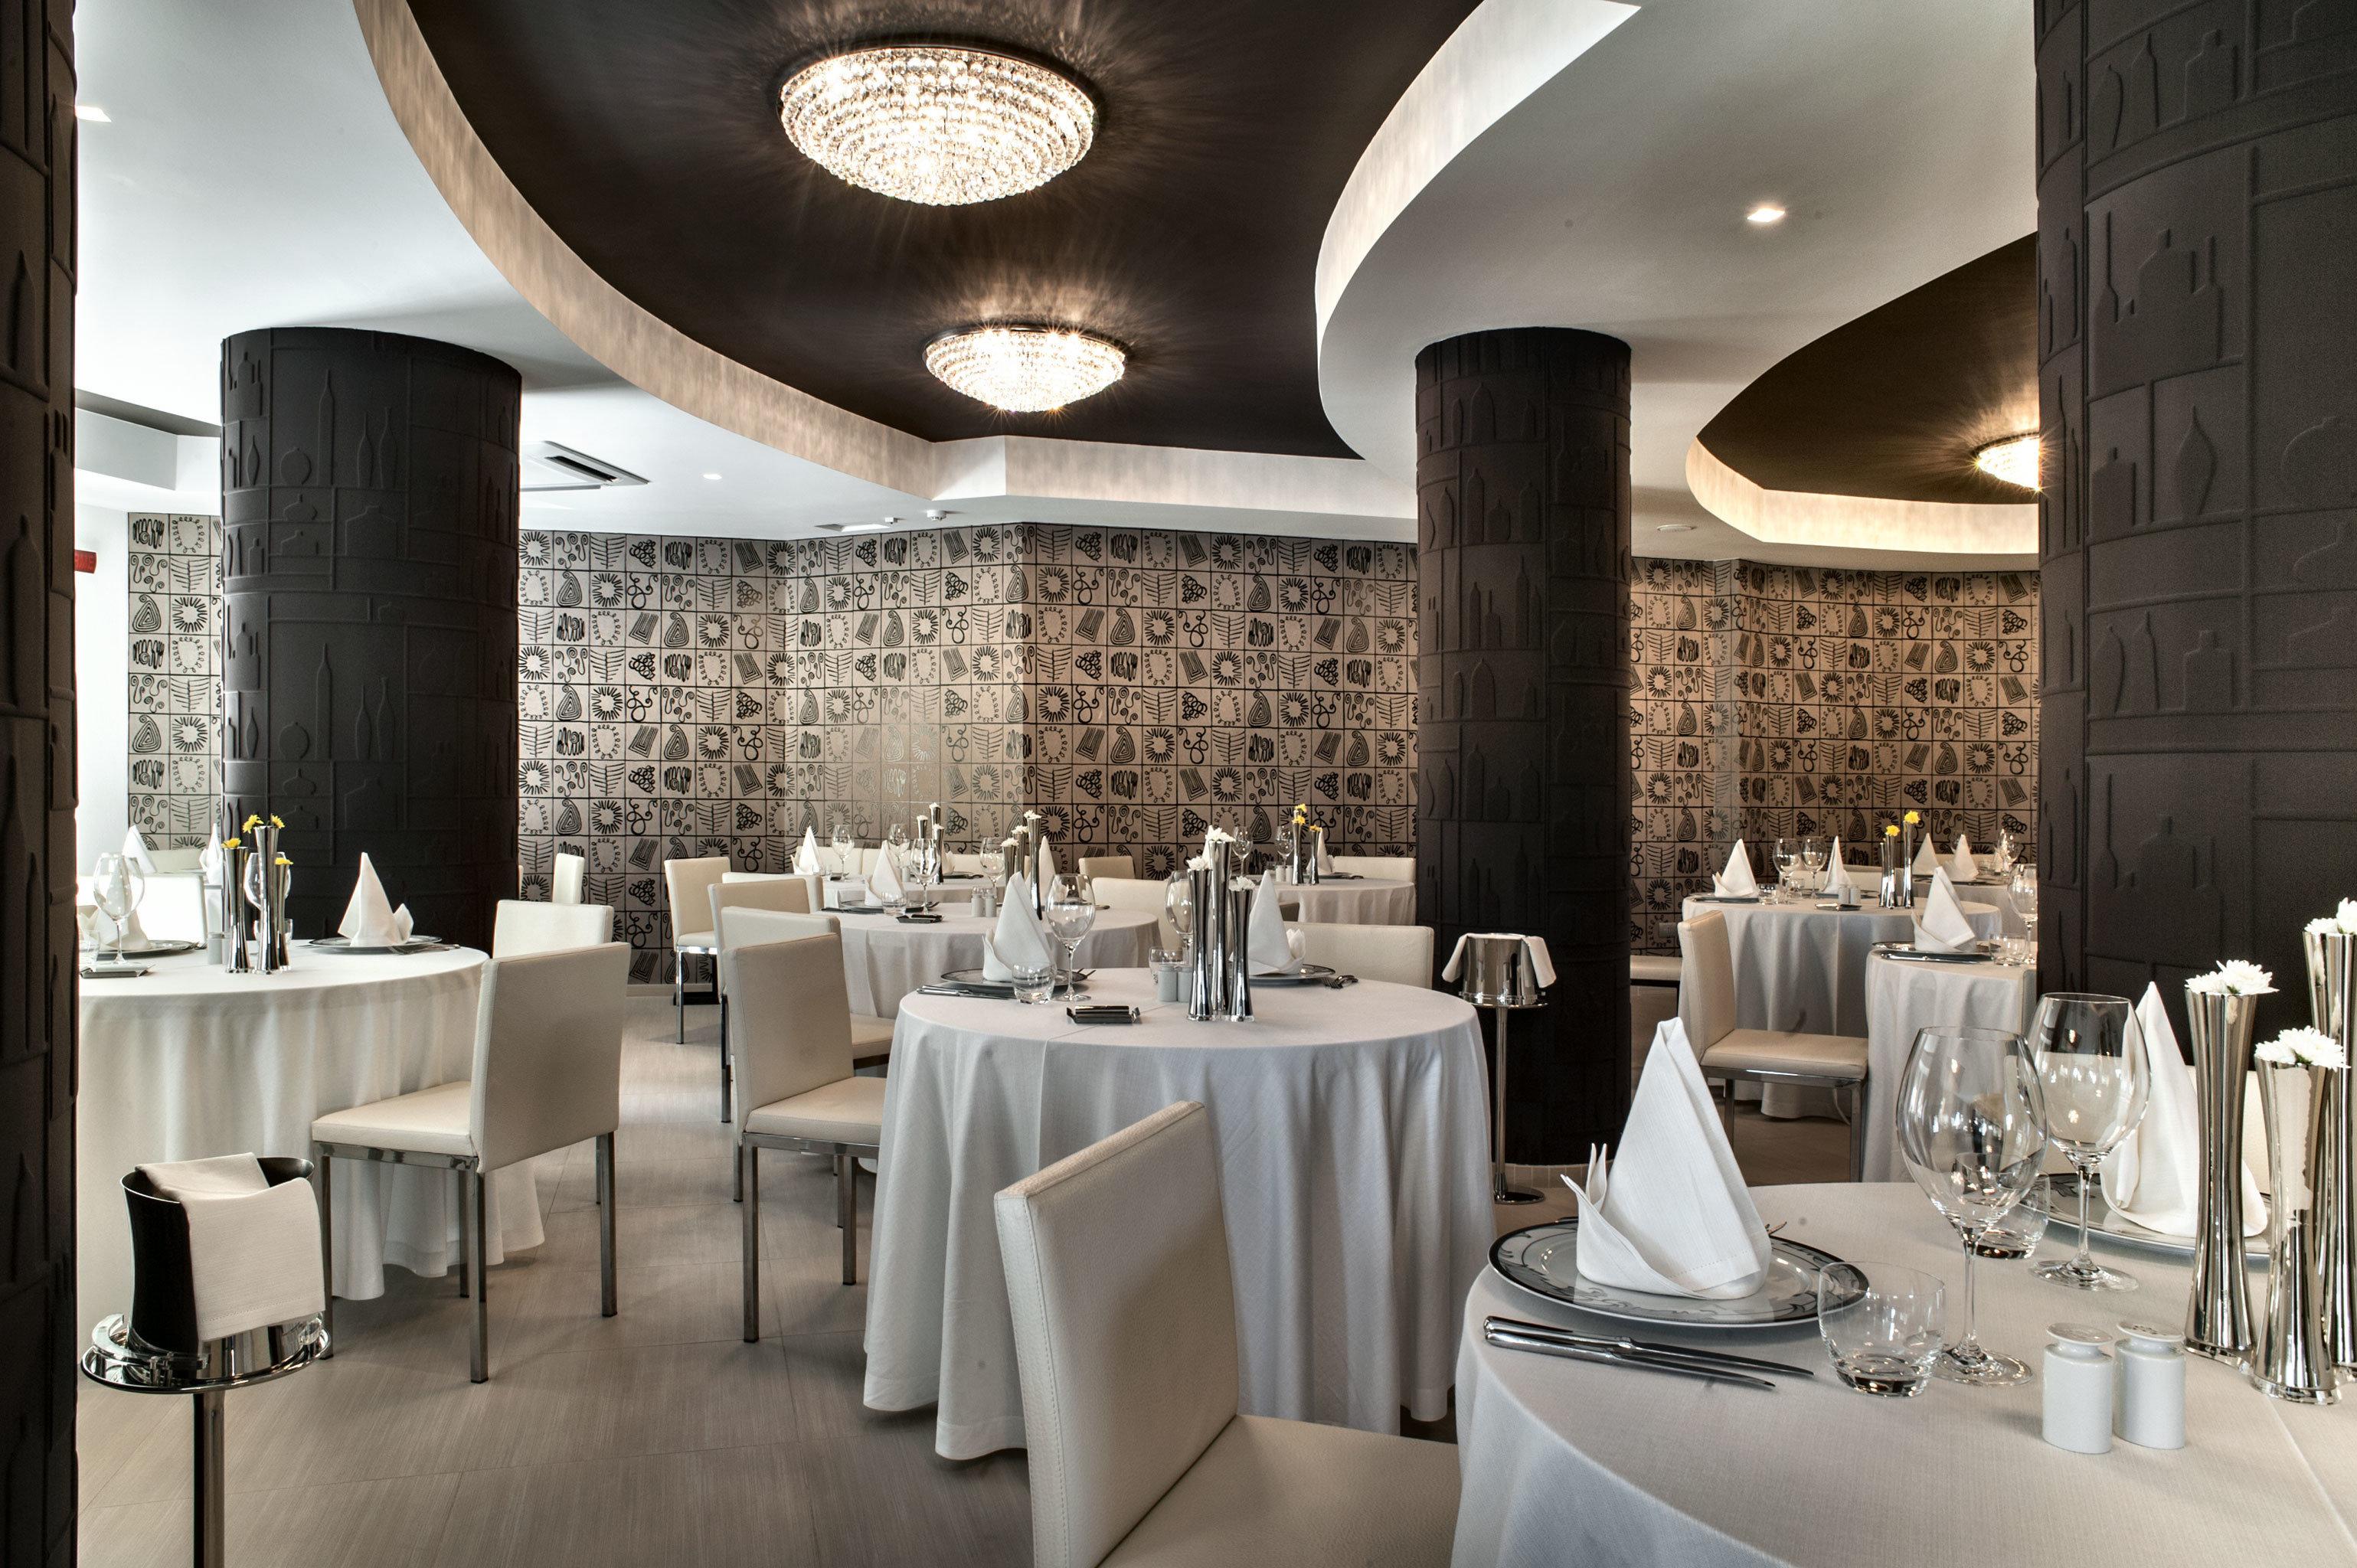 Dining Hip Luxury function hall restaurant ballroom wedding reception banquet dining table